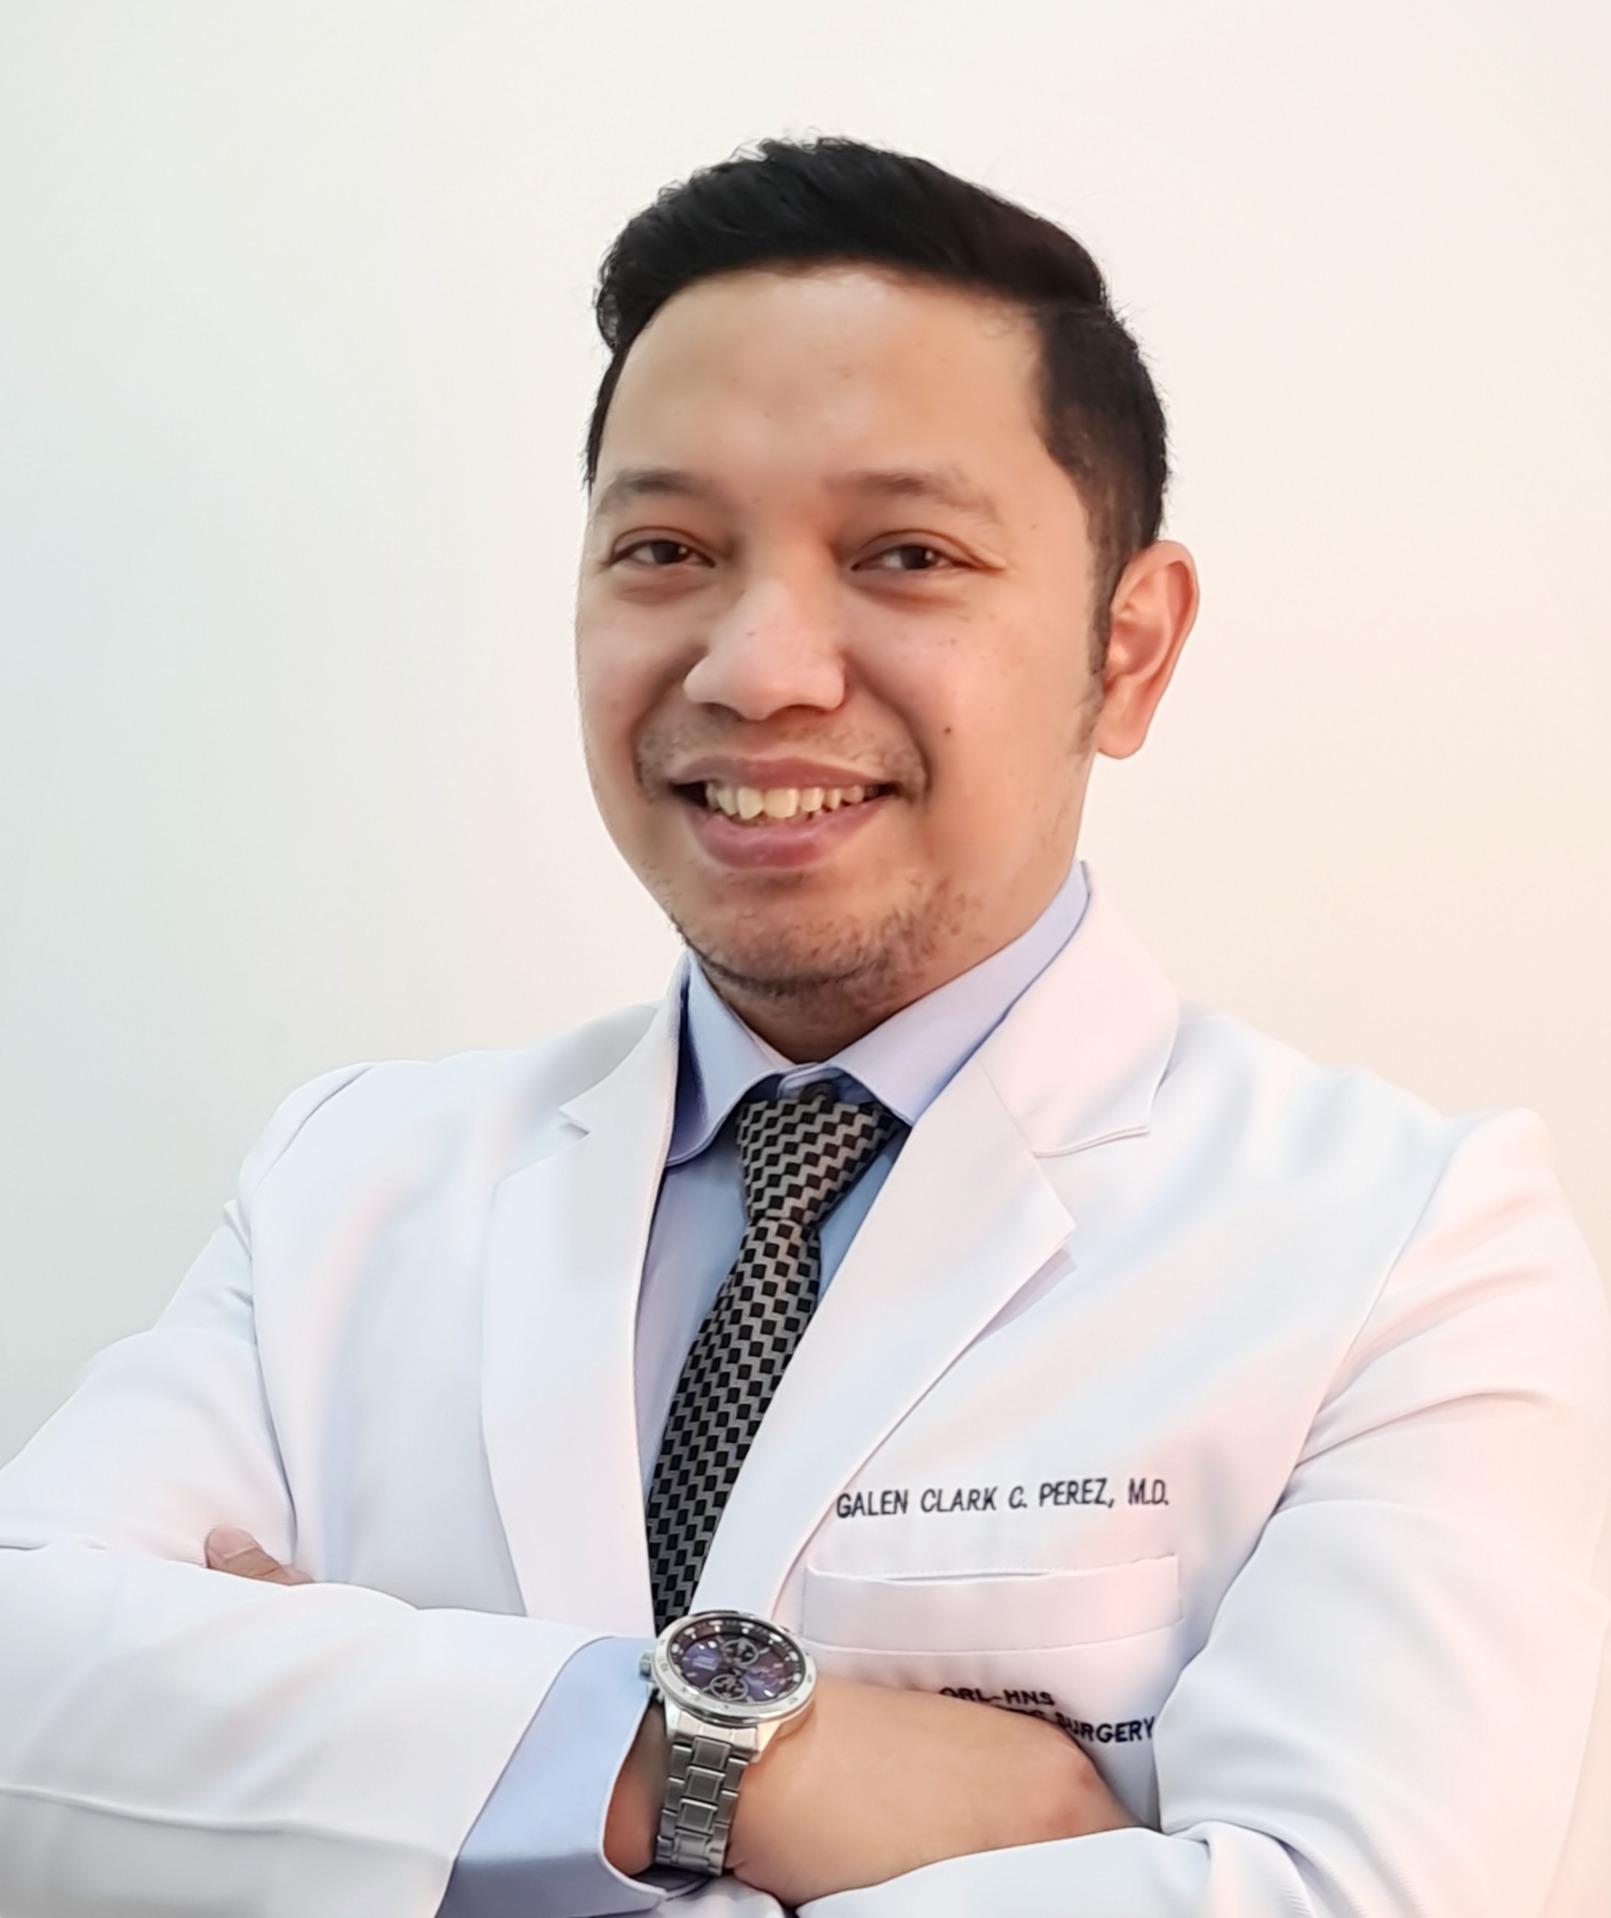 Galen Clark Perez MD, FPSO-HNS